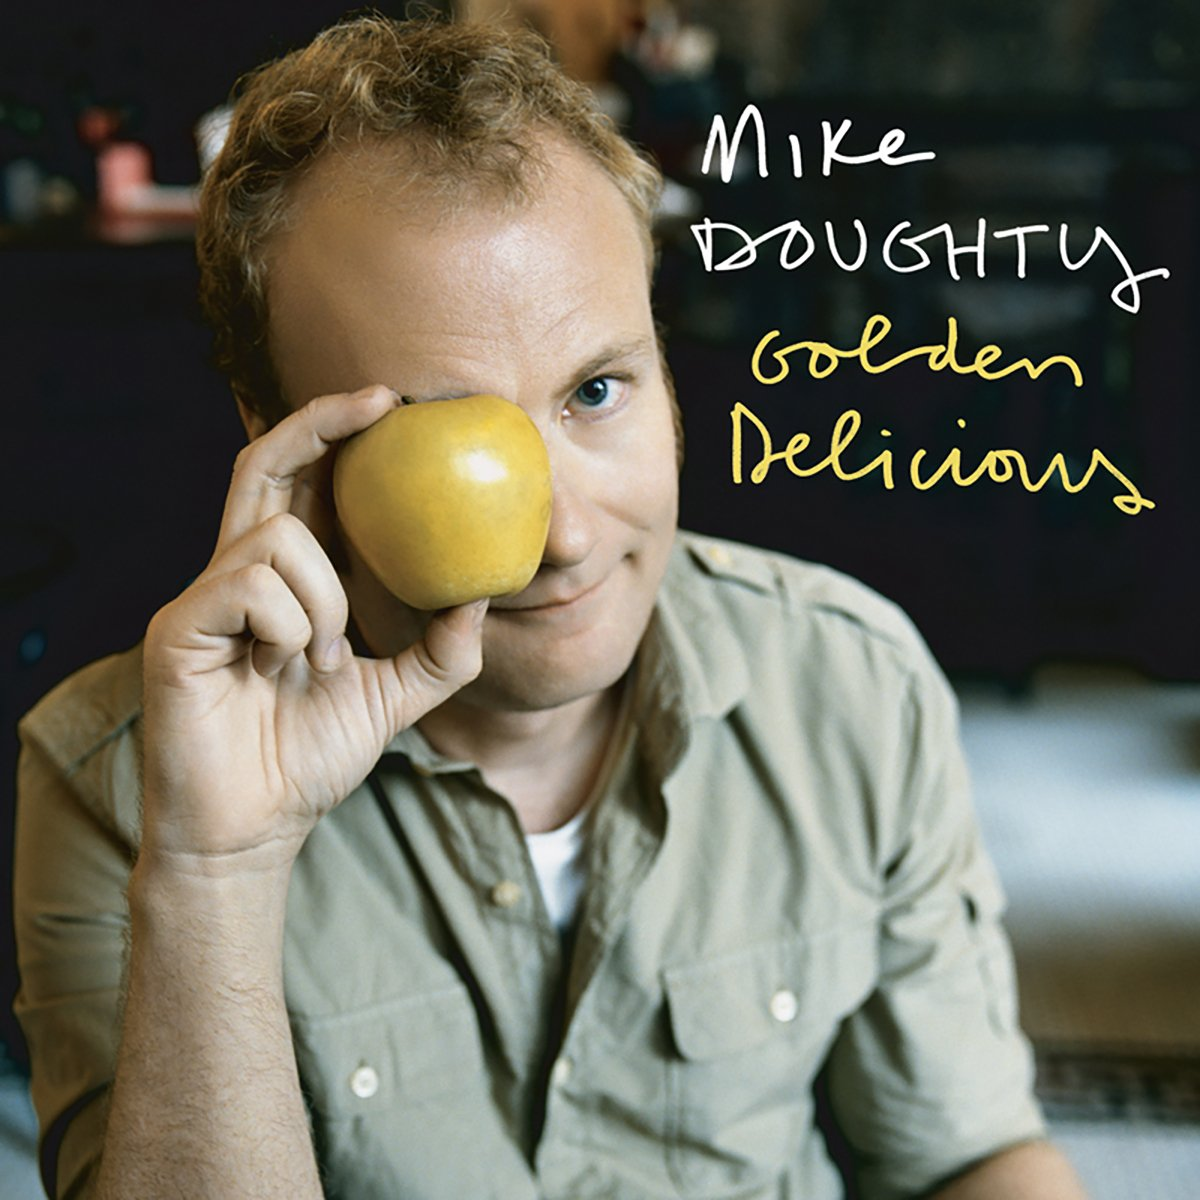 Mike Doughty, Golden Delicious